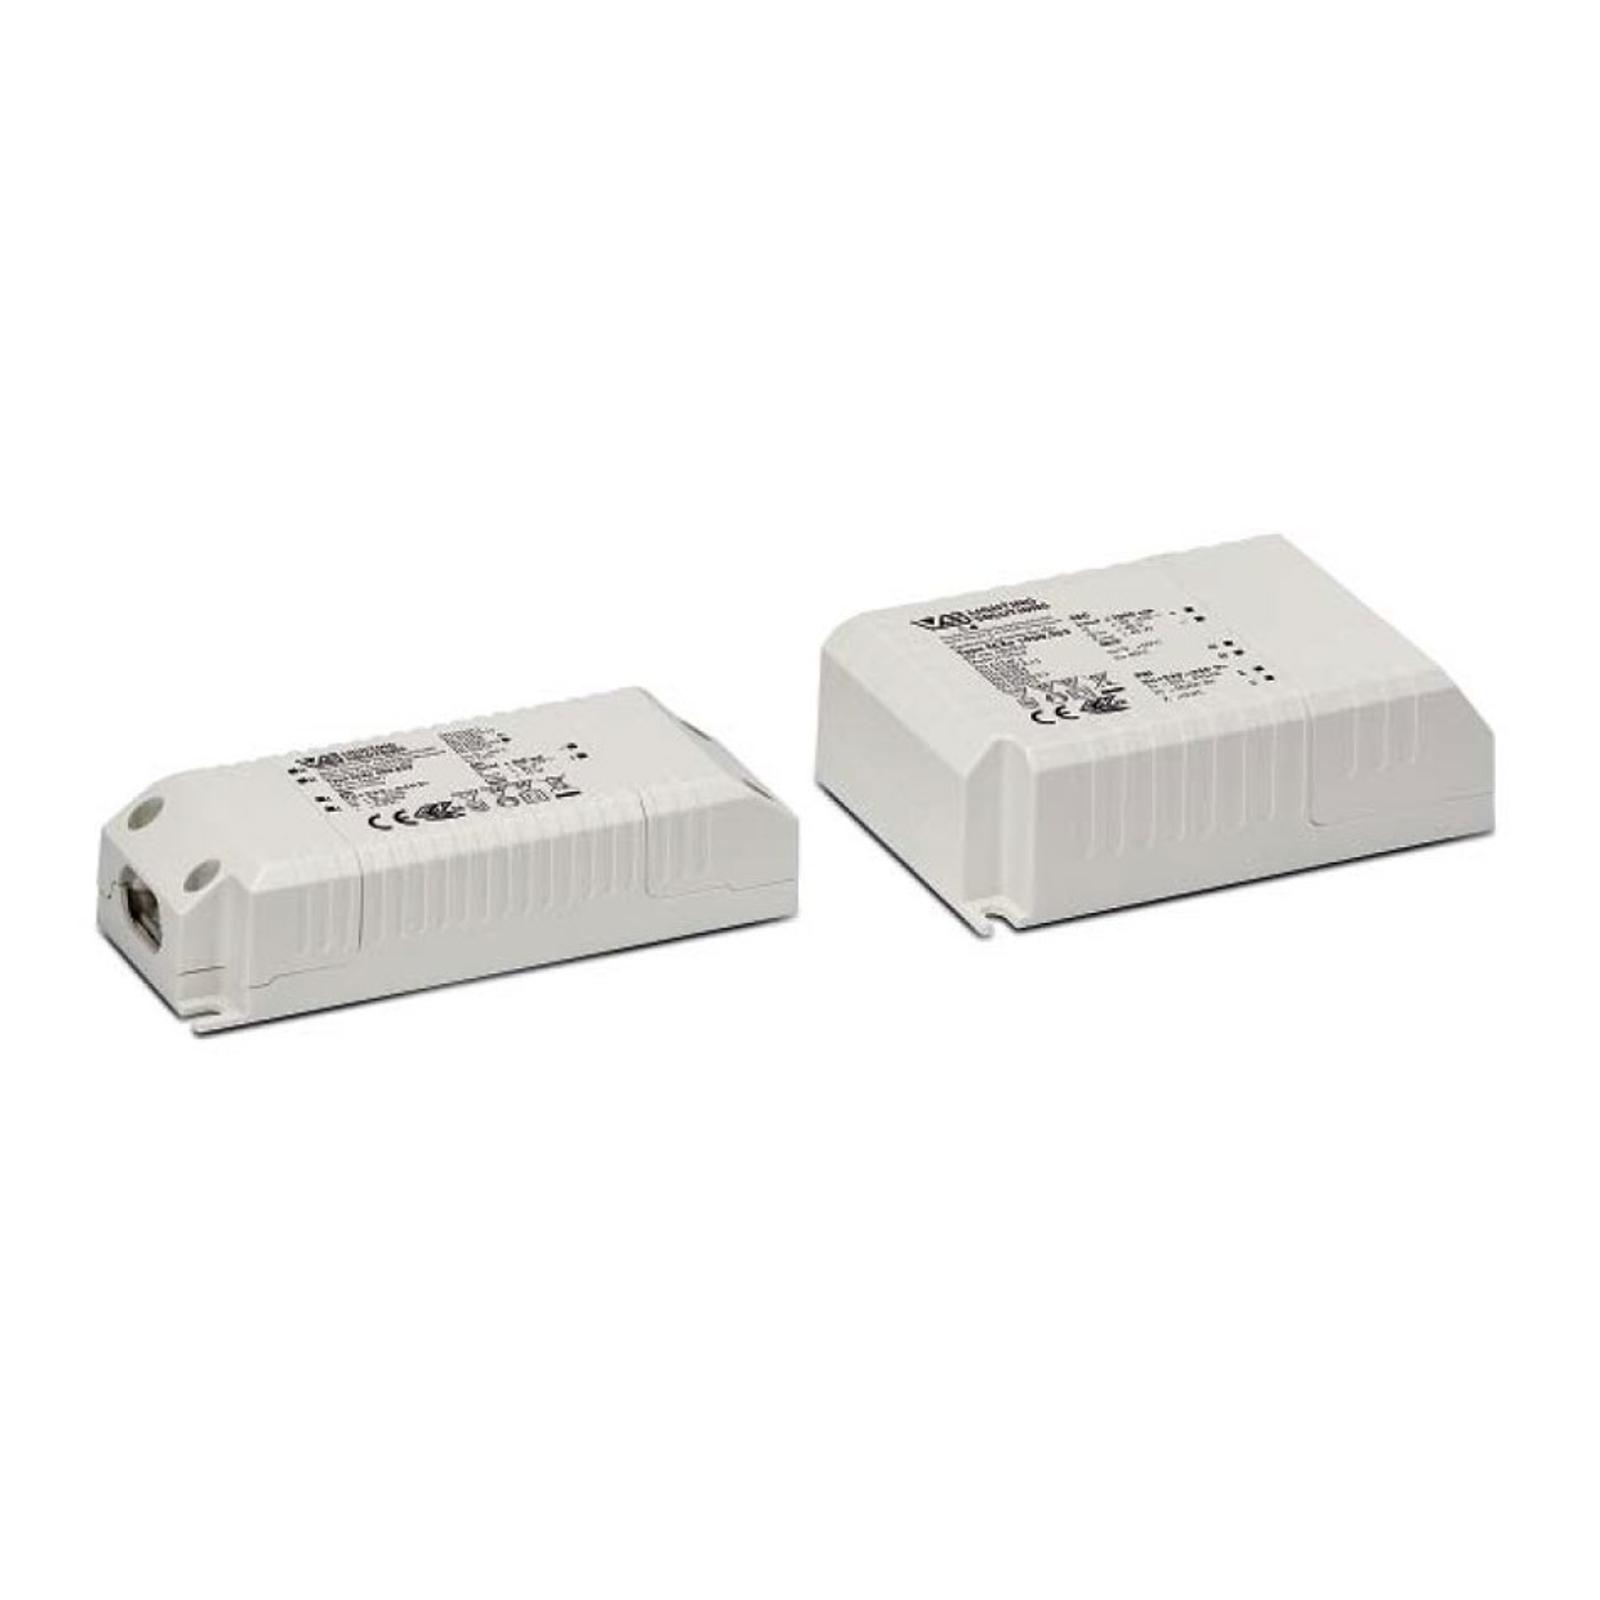 LED-Treiber 1.050mA 32-45W, Konstantstrom